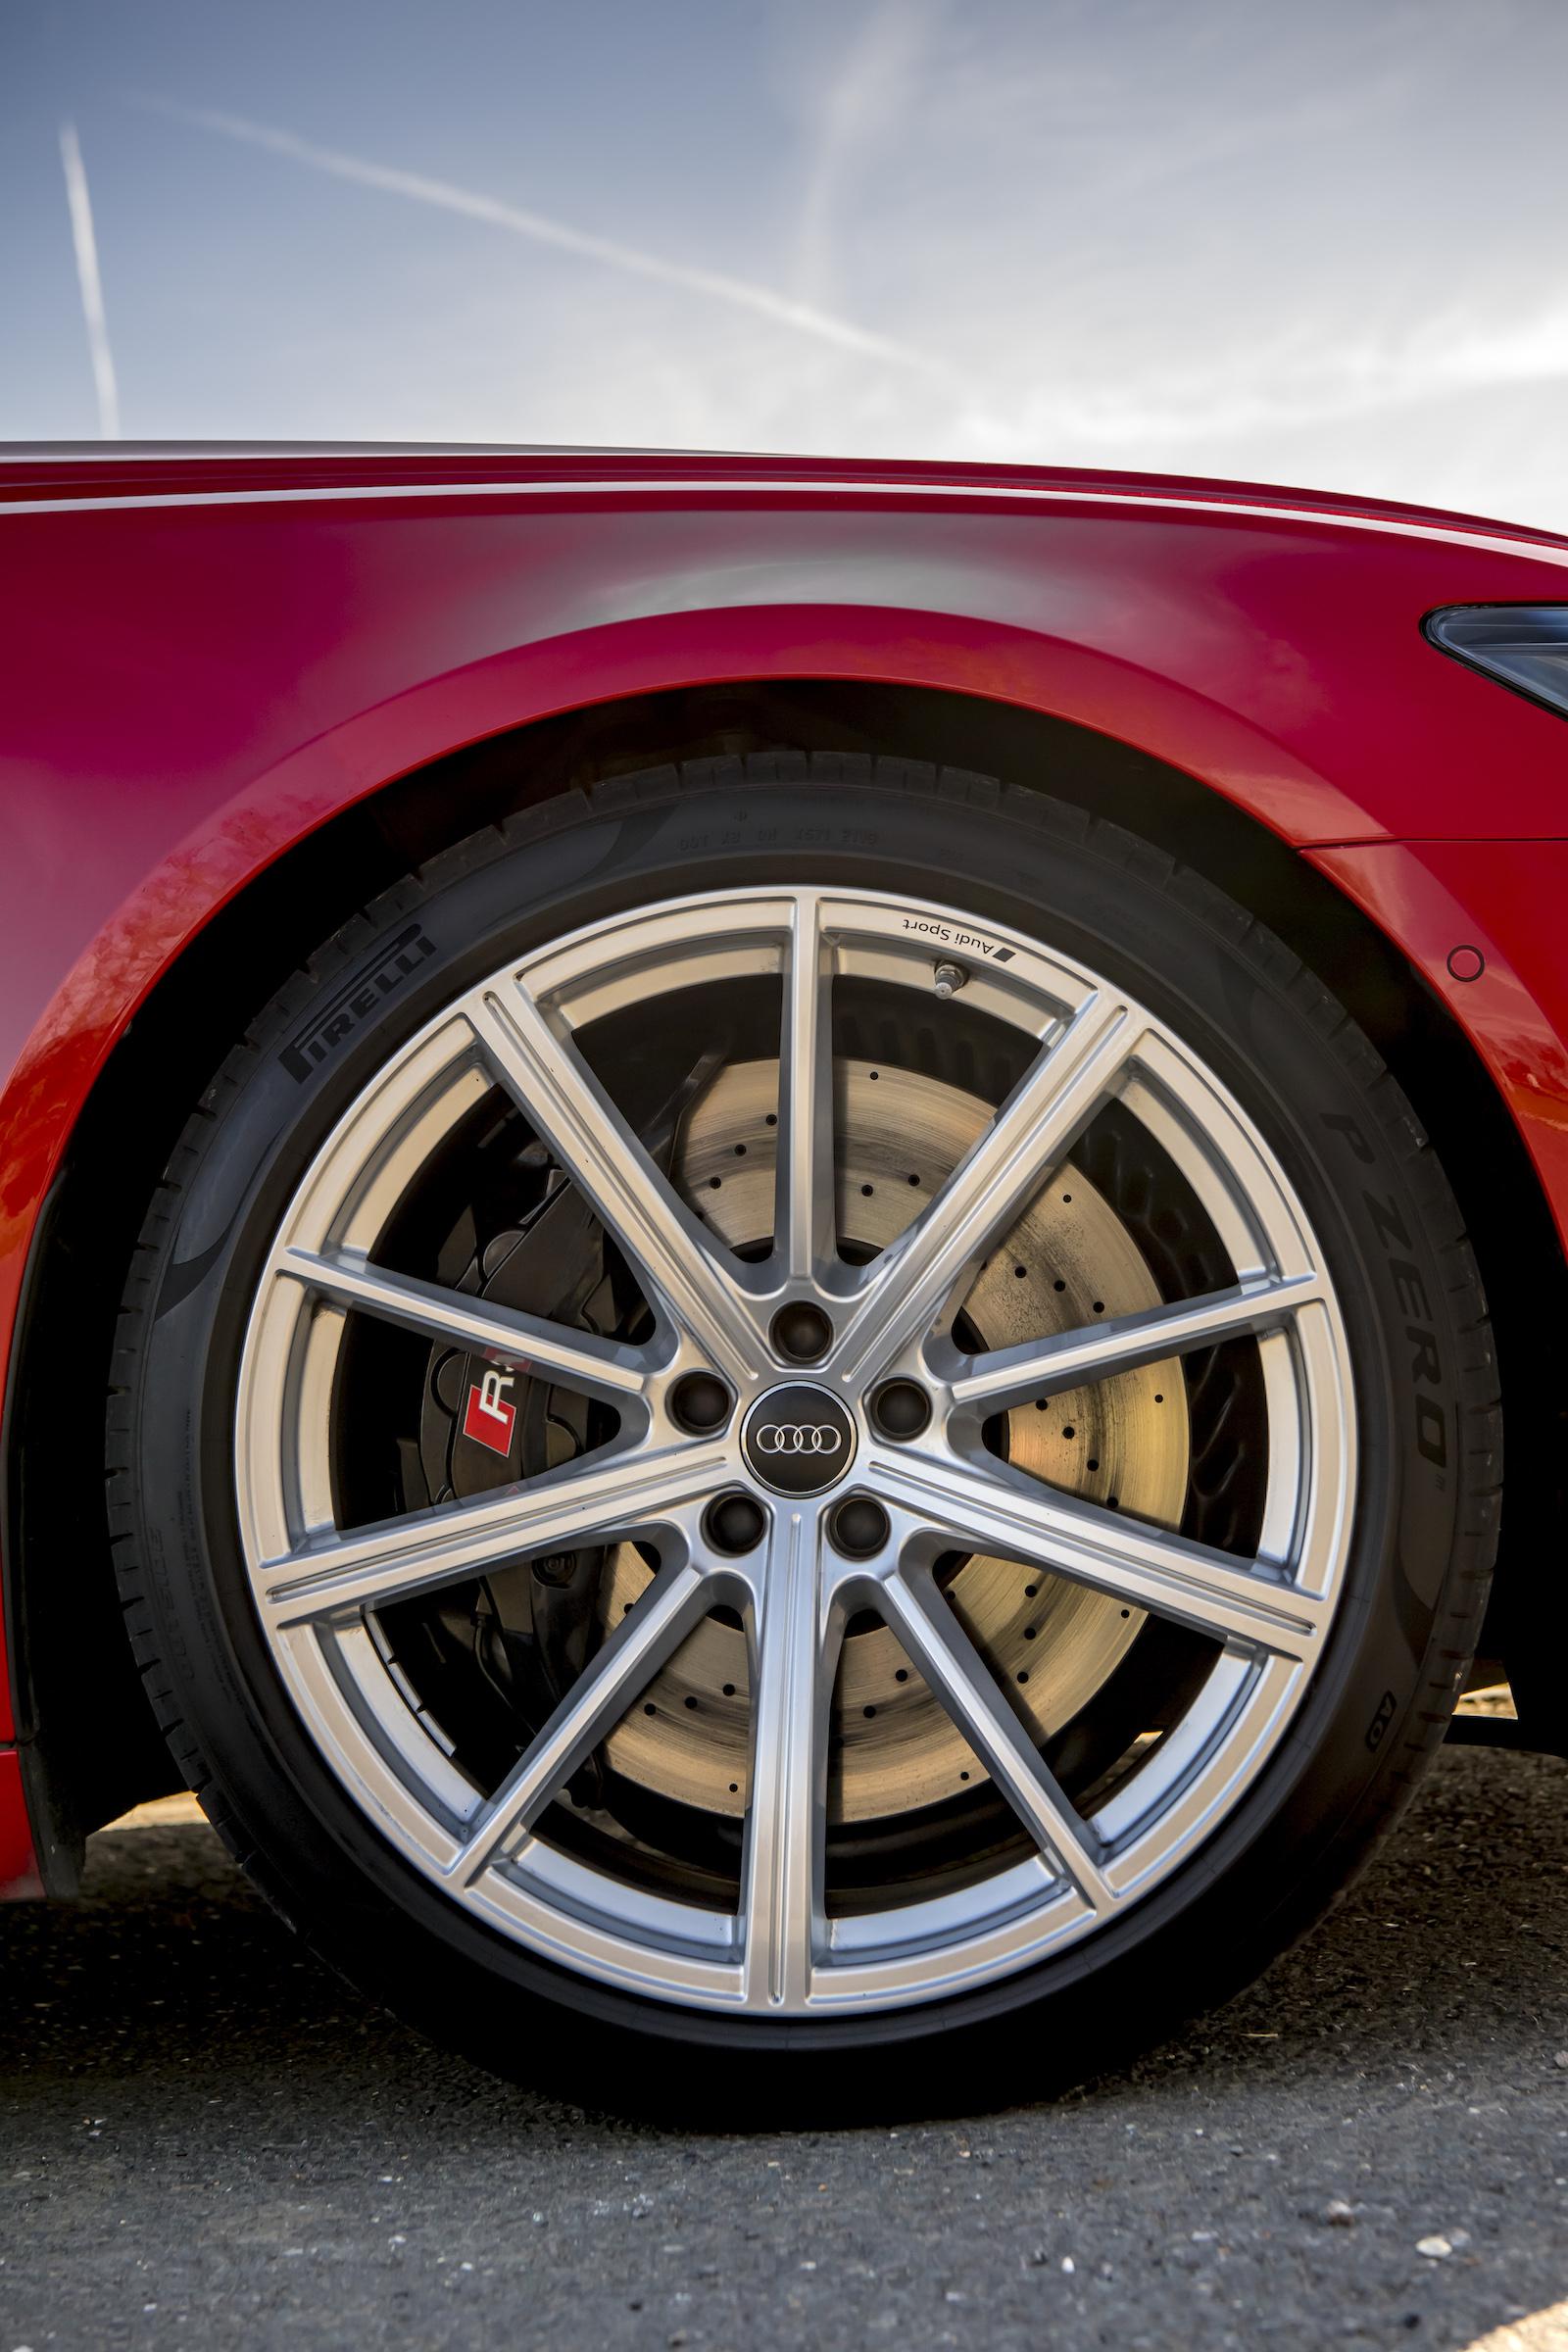 Audi RS6 front wheel detail